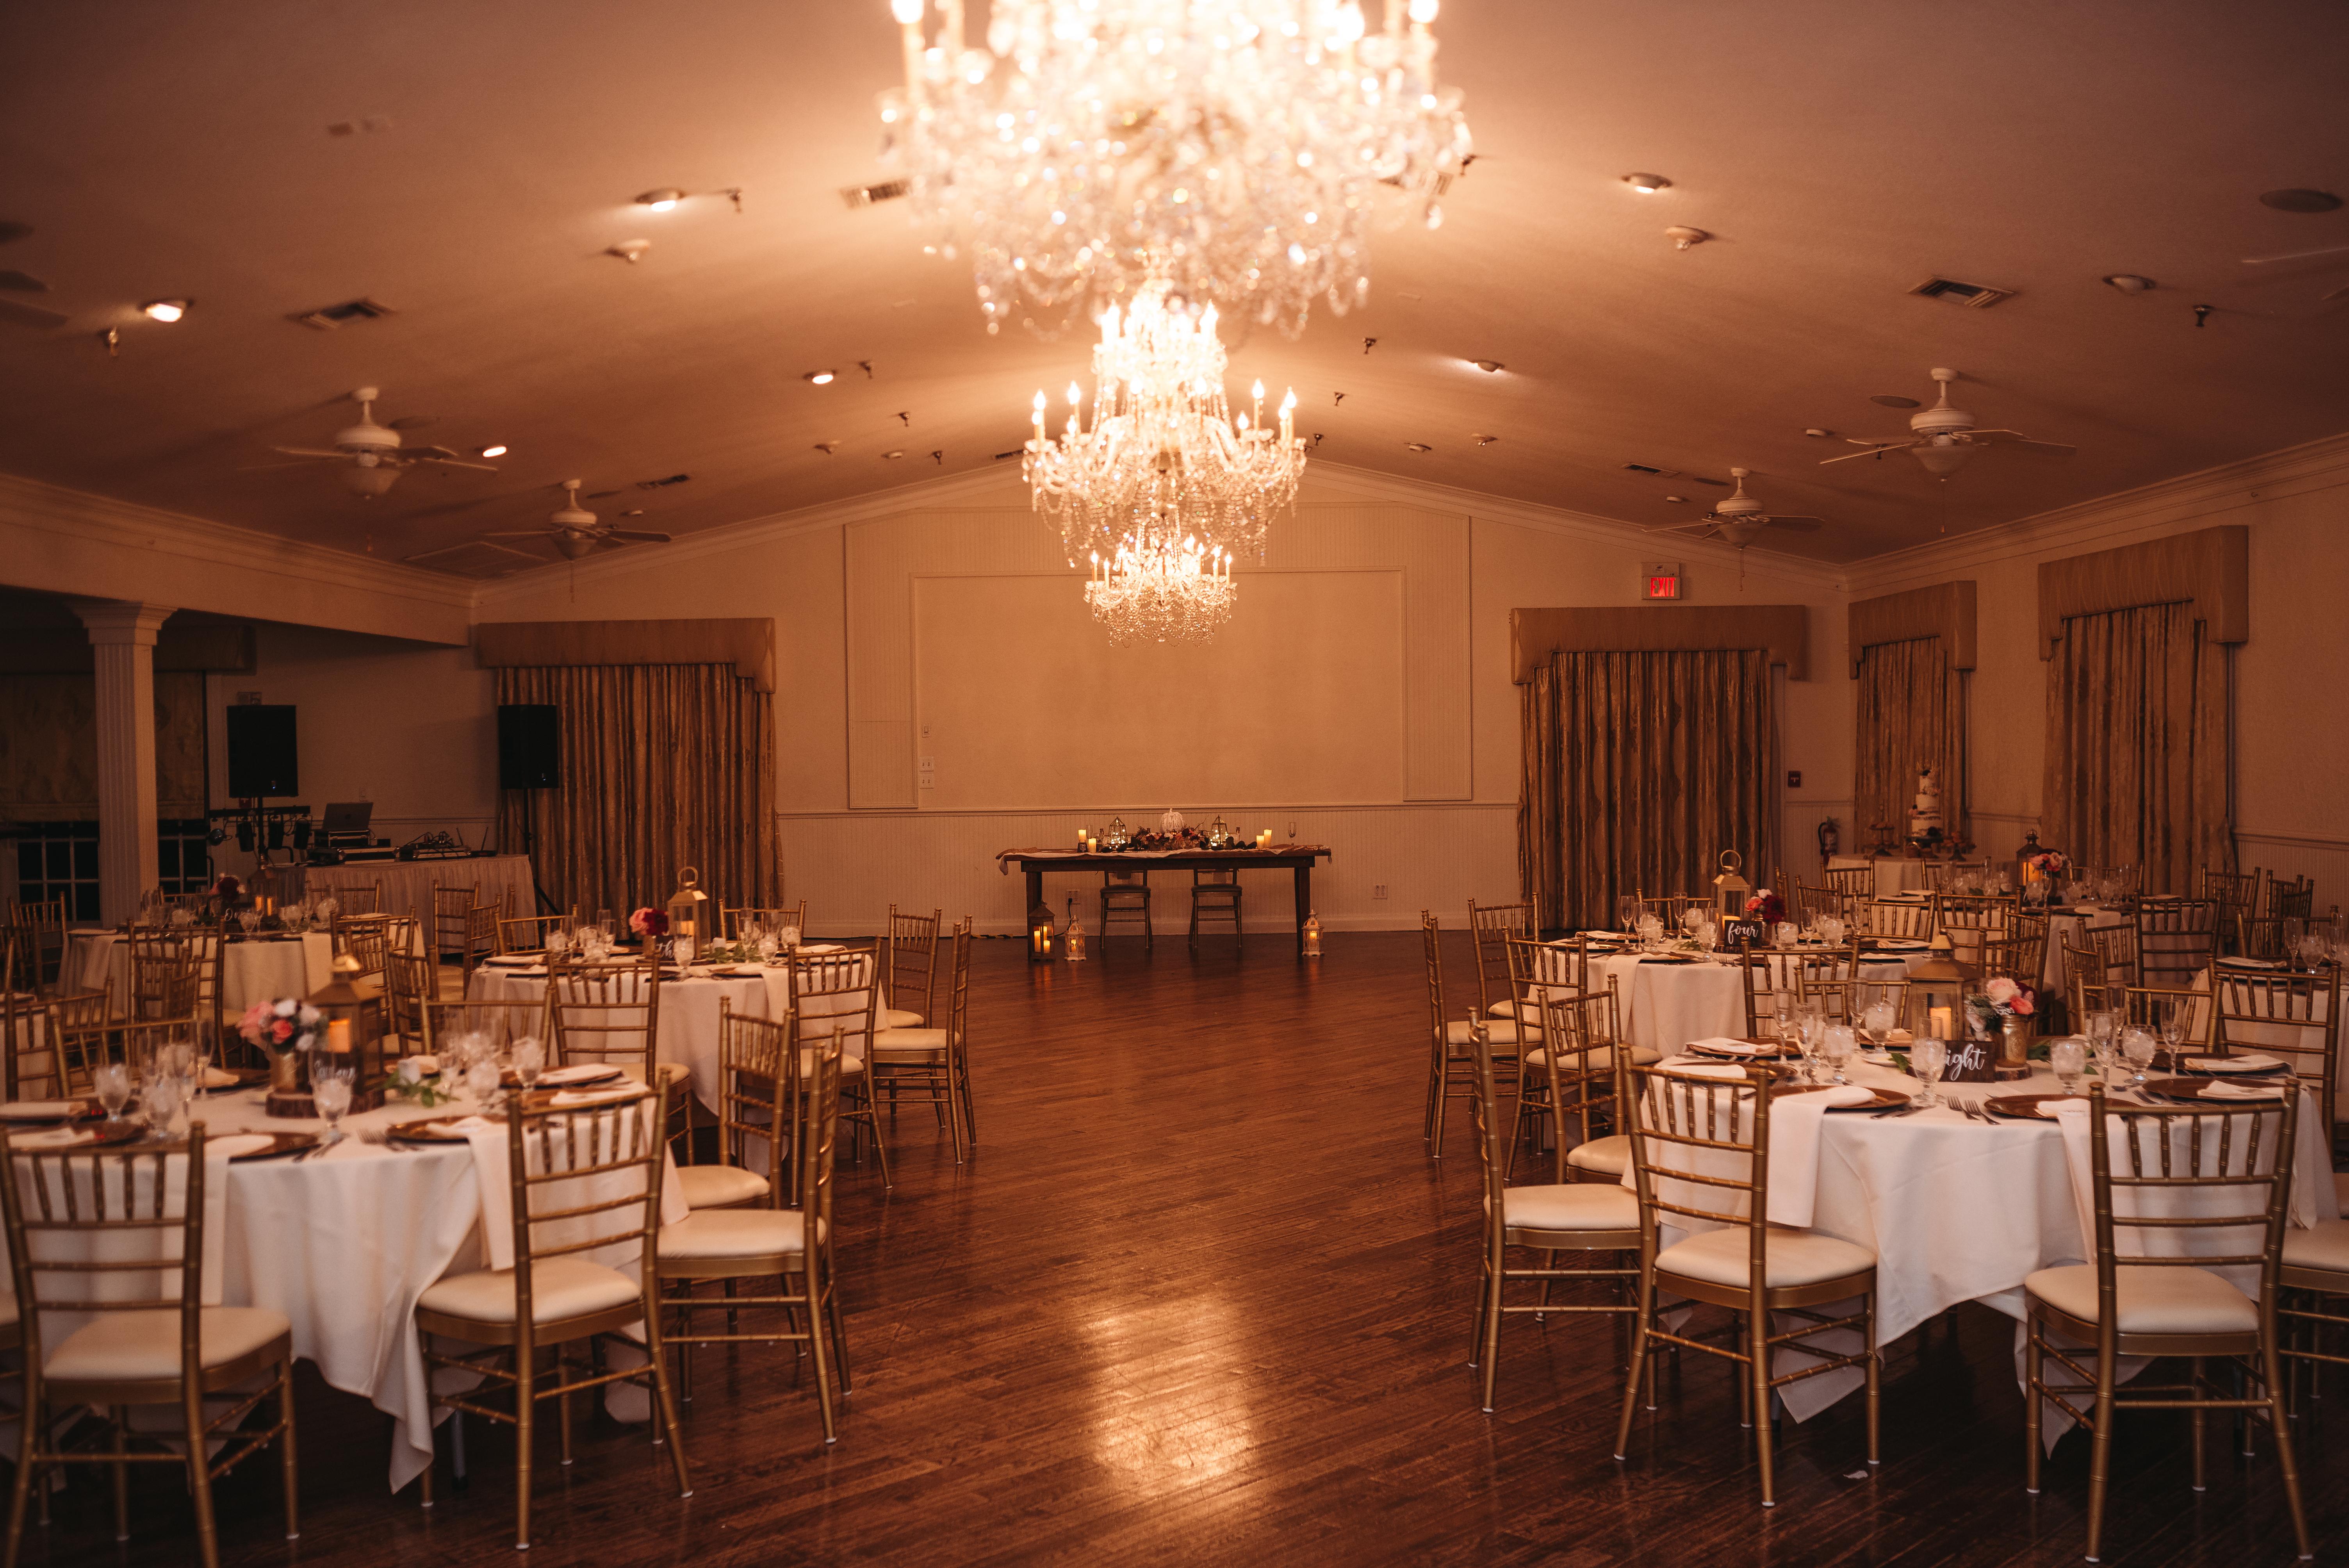 orlando wedding venue - the highland manor - dubsdread catering - ballroom